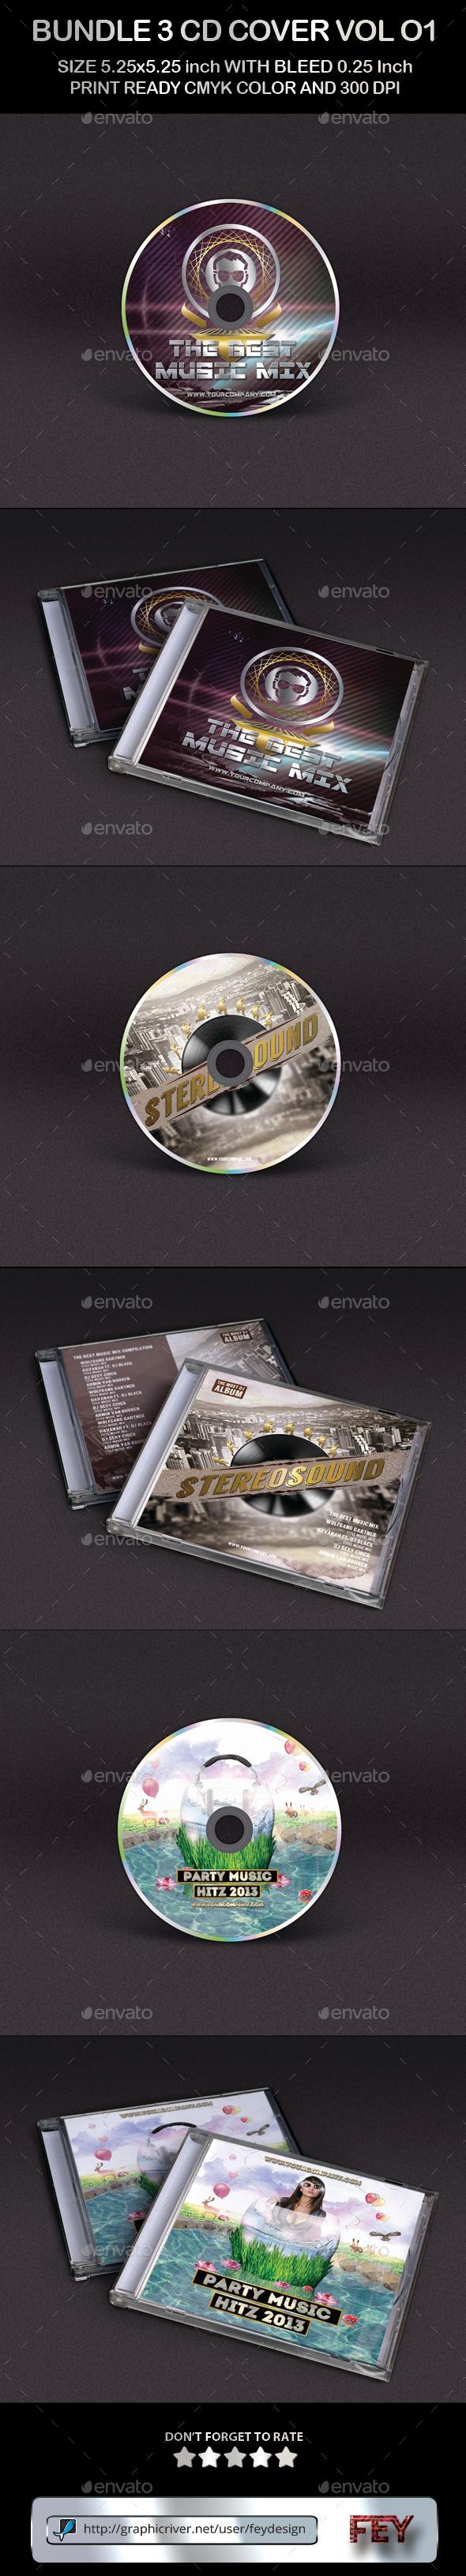 Bundle 3 CD Cover Template Vol.01 - CD & DVD Artwork Print Templates